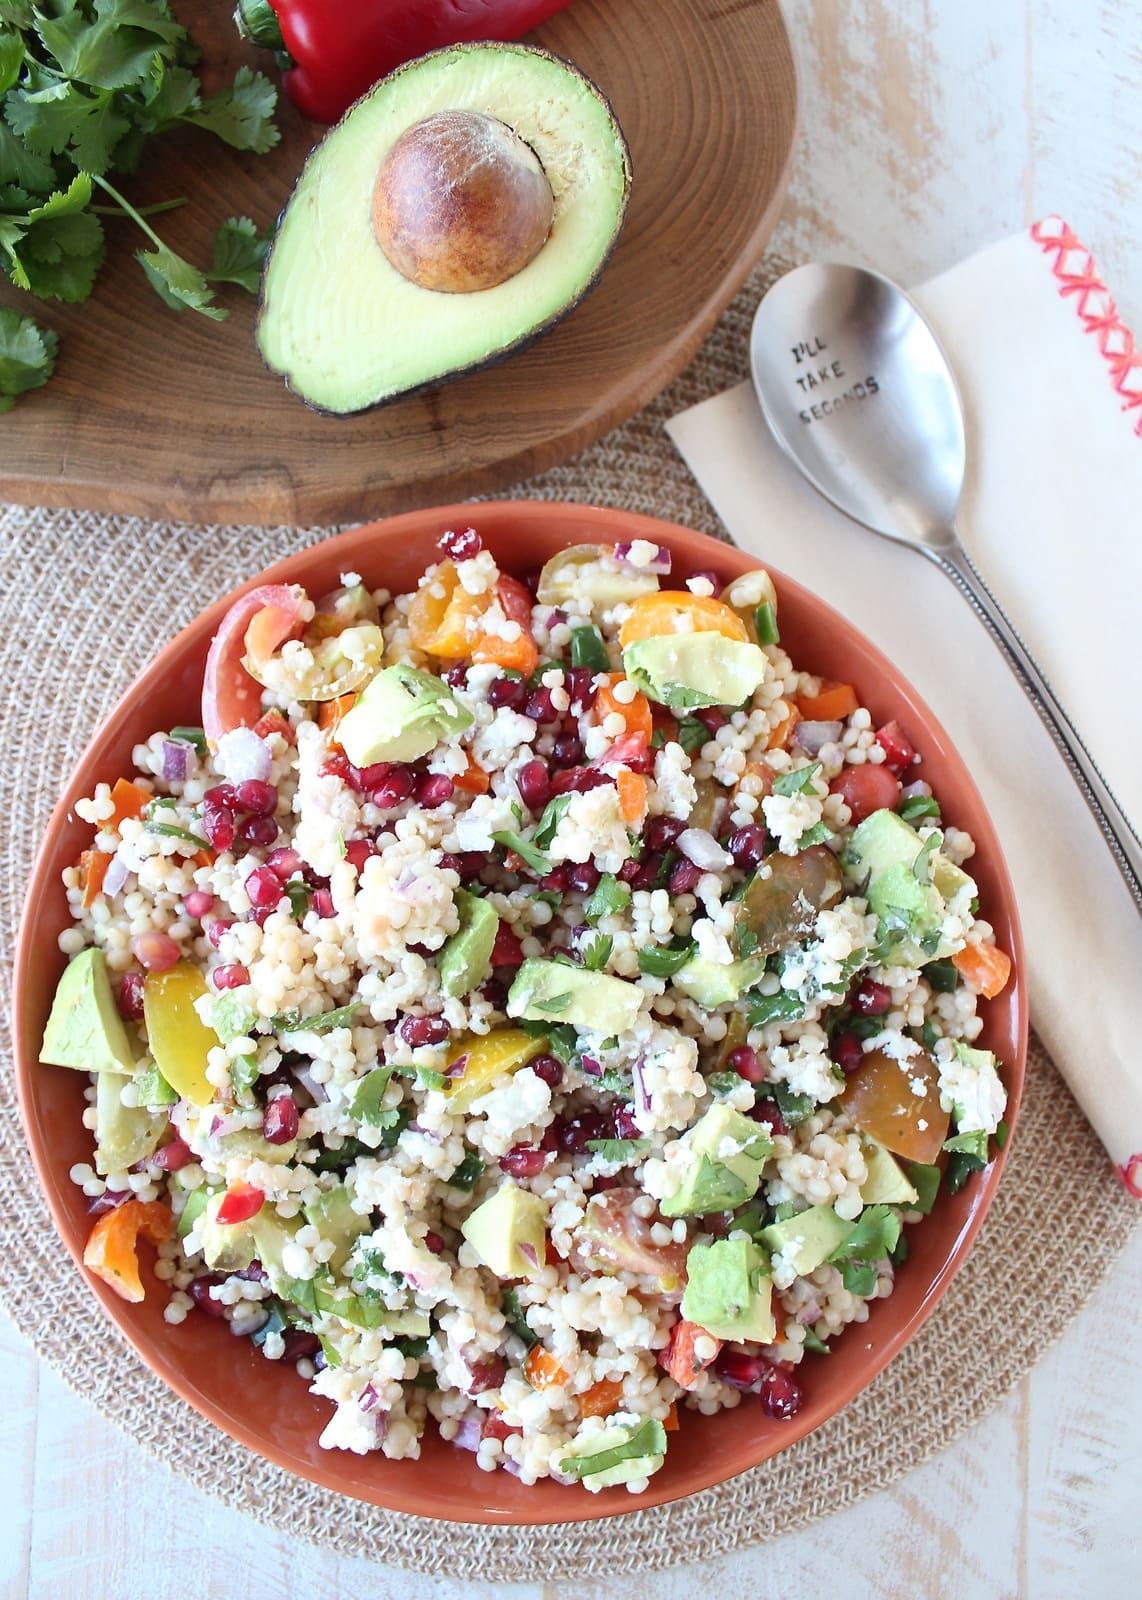 Israeli Couscous And California Avocado Salad Recipe ...